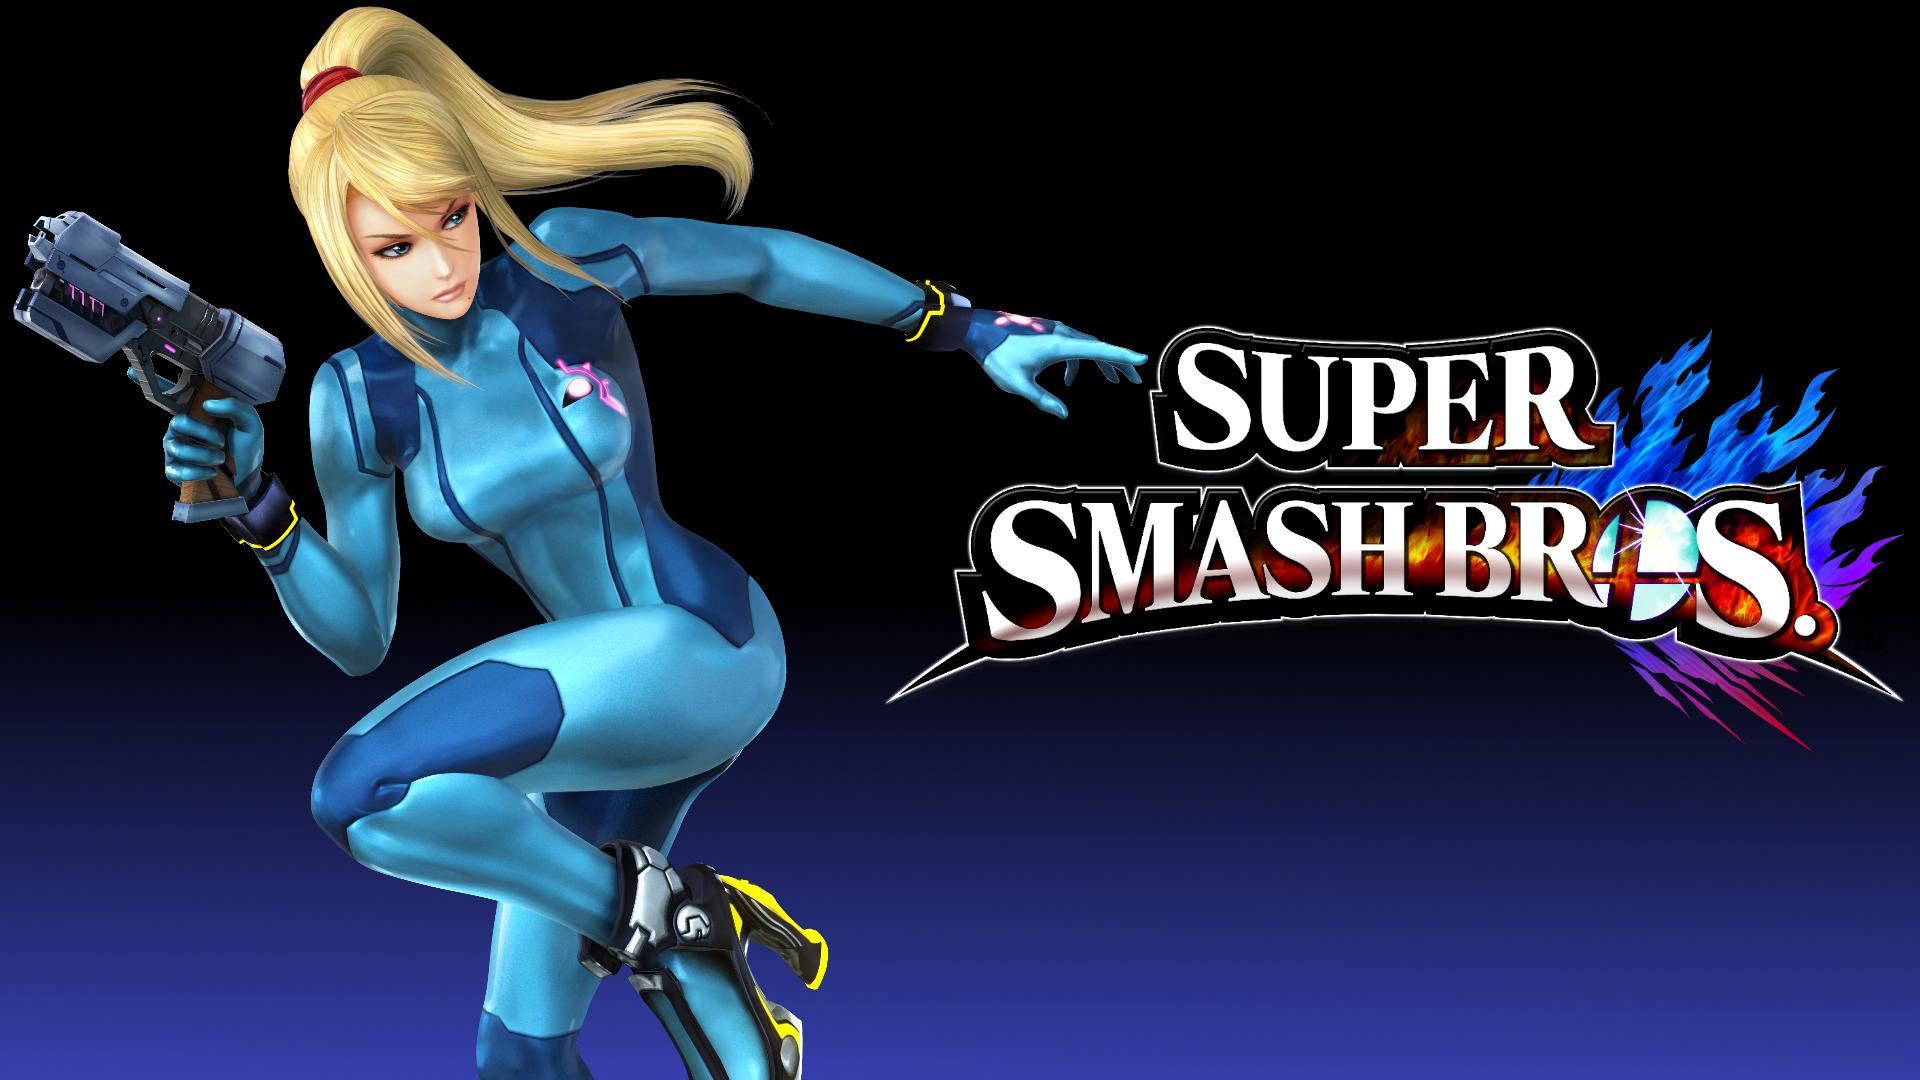 Super Smash Bros 4 Wallpaper Zero Suit Samus By Thewolfgalaxy On Deviantart